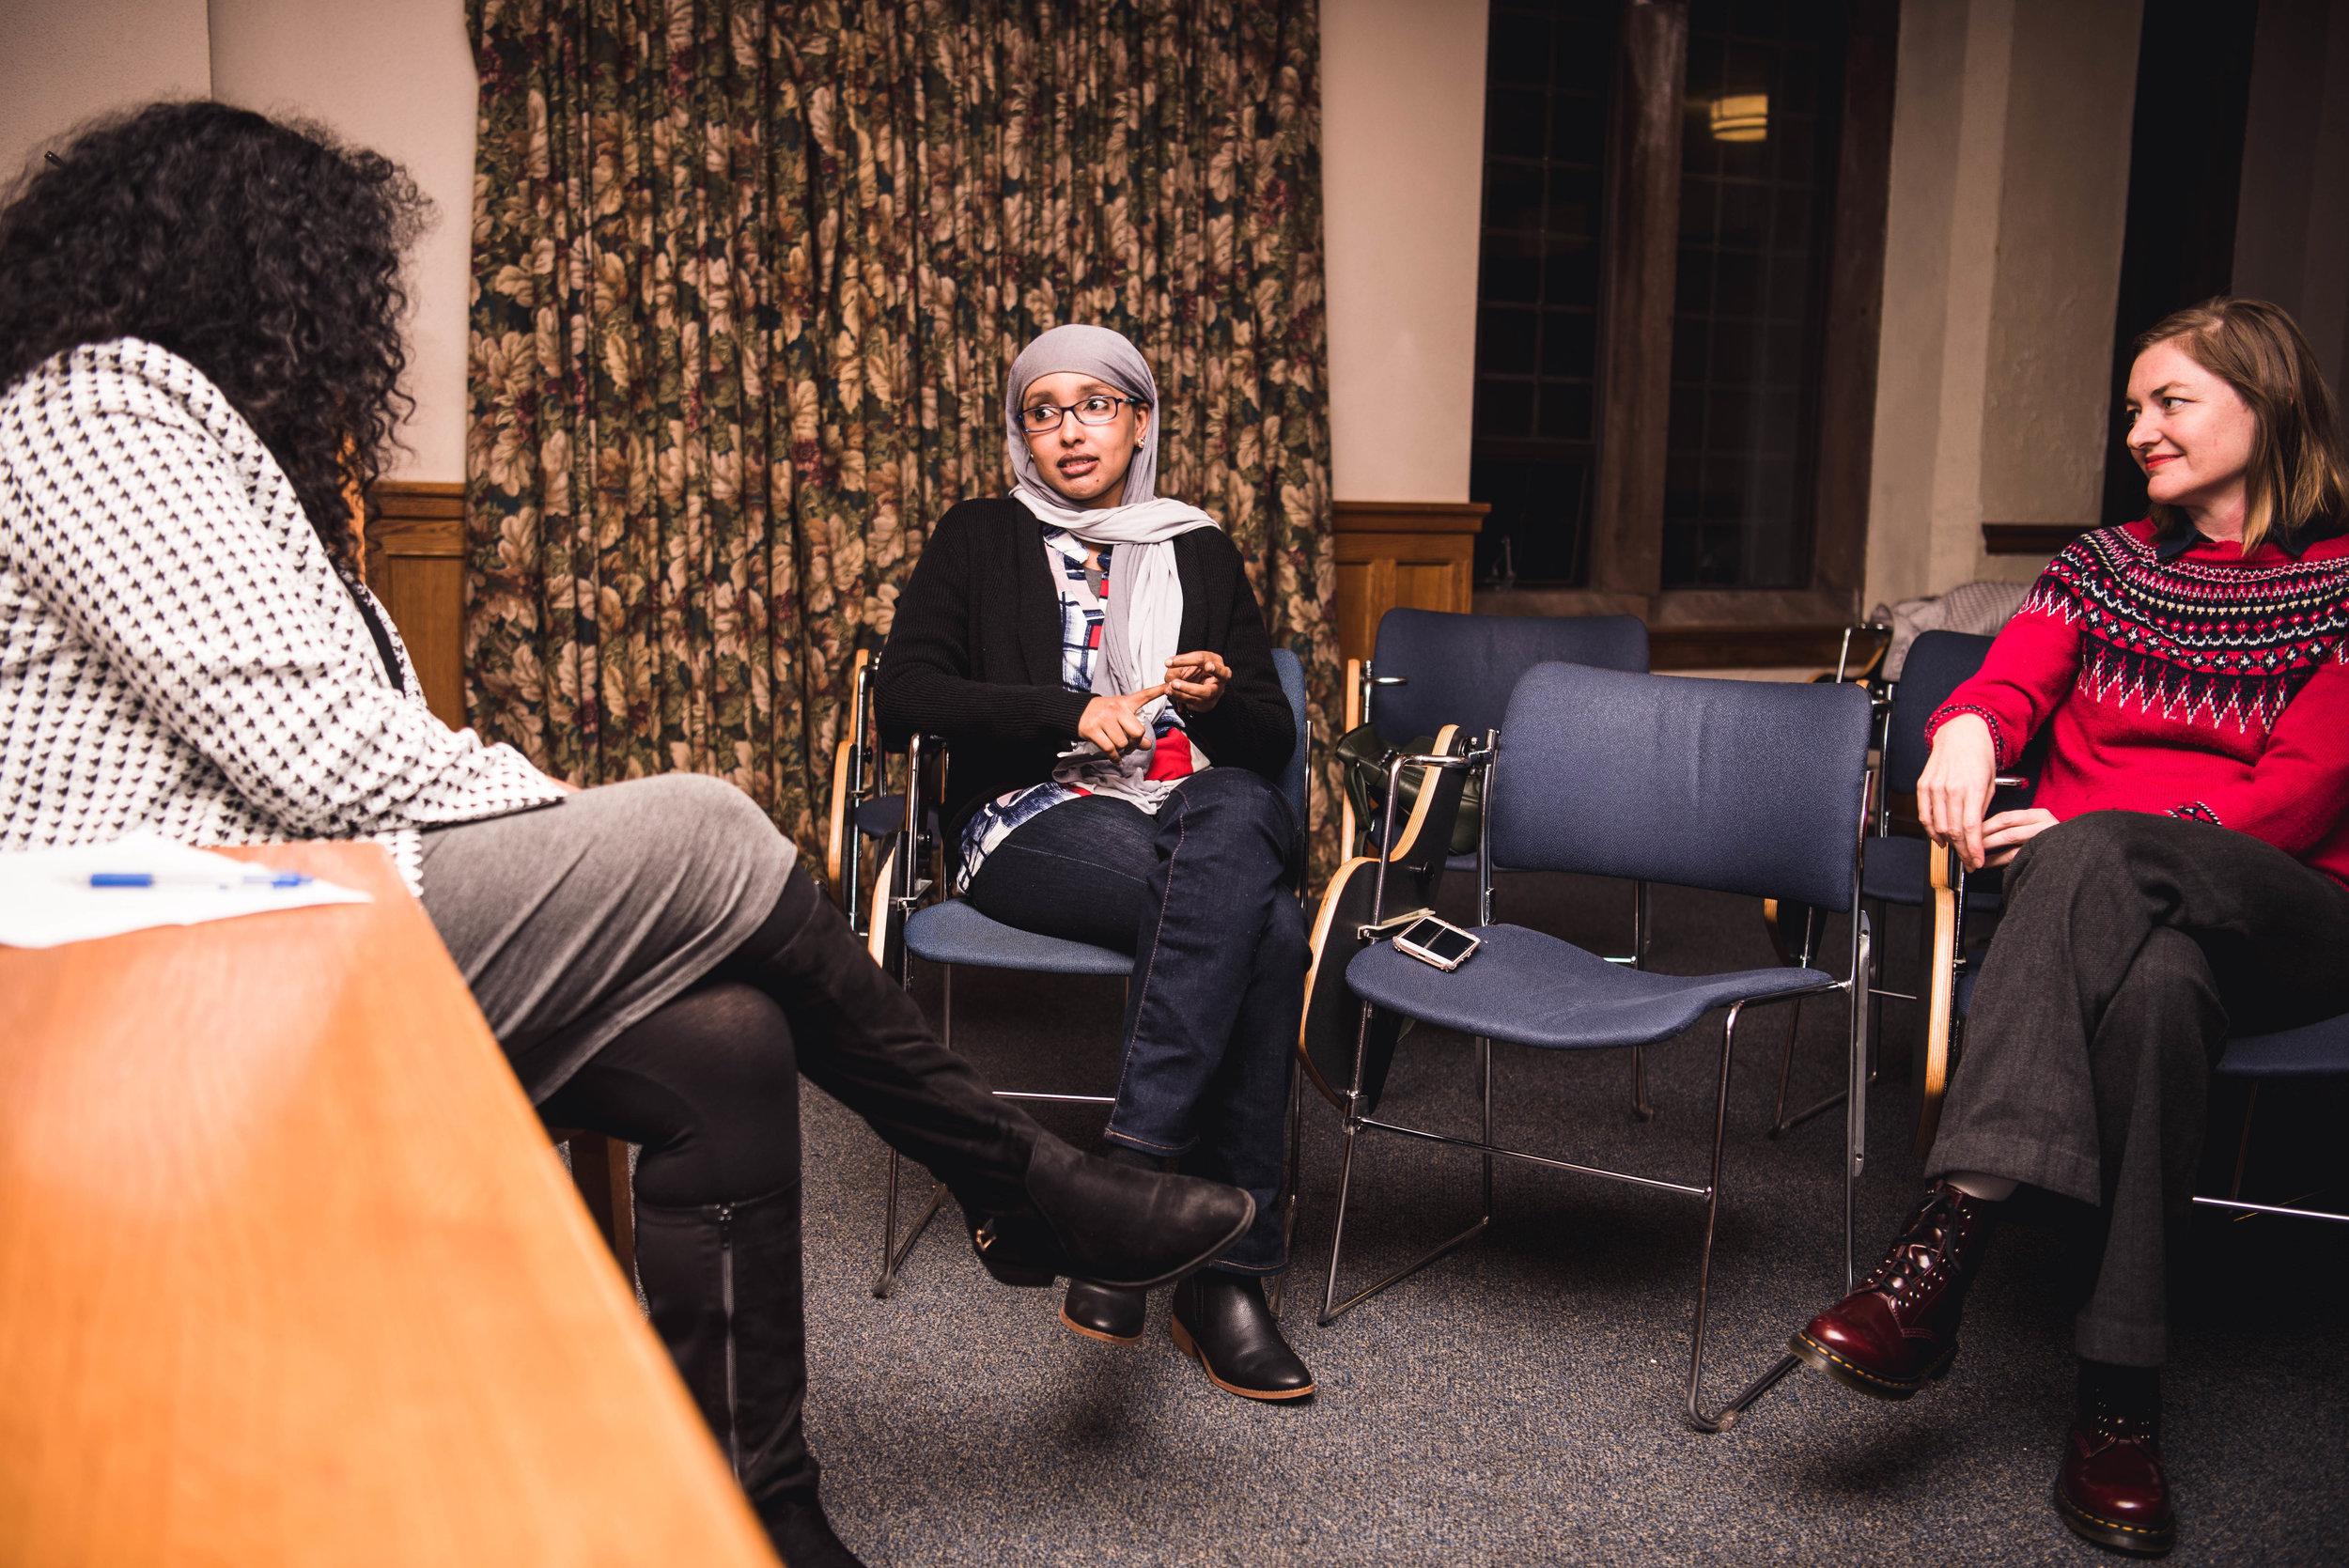 Baljeet Sandhu, Fauziya Ali, and Joy Olivier speak during a Global Innovation Series event.